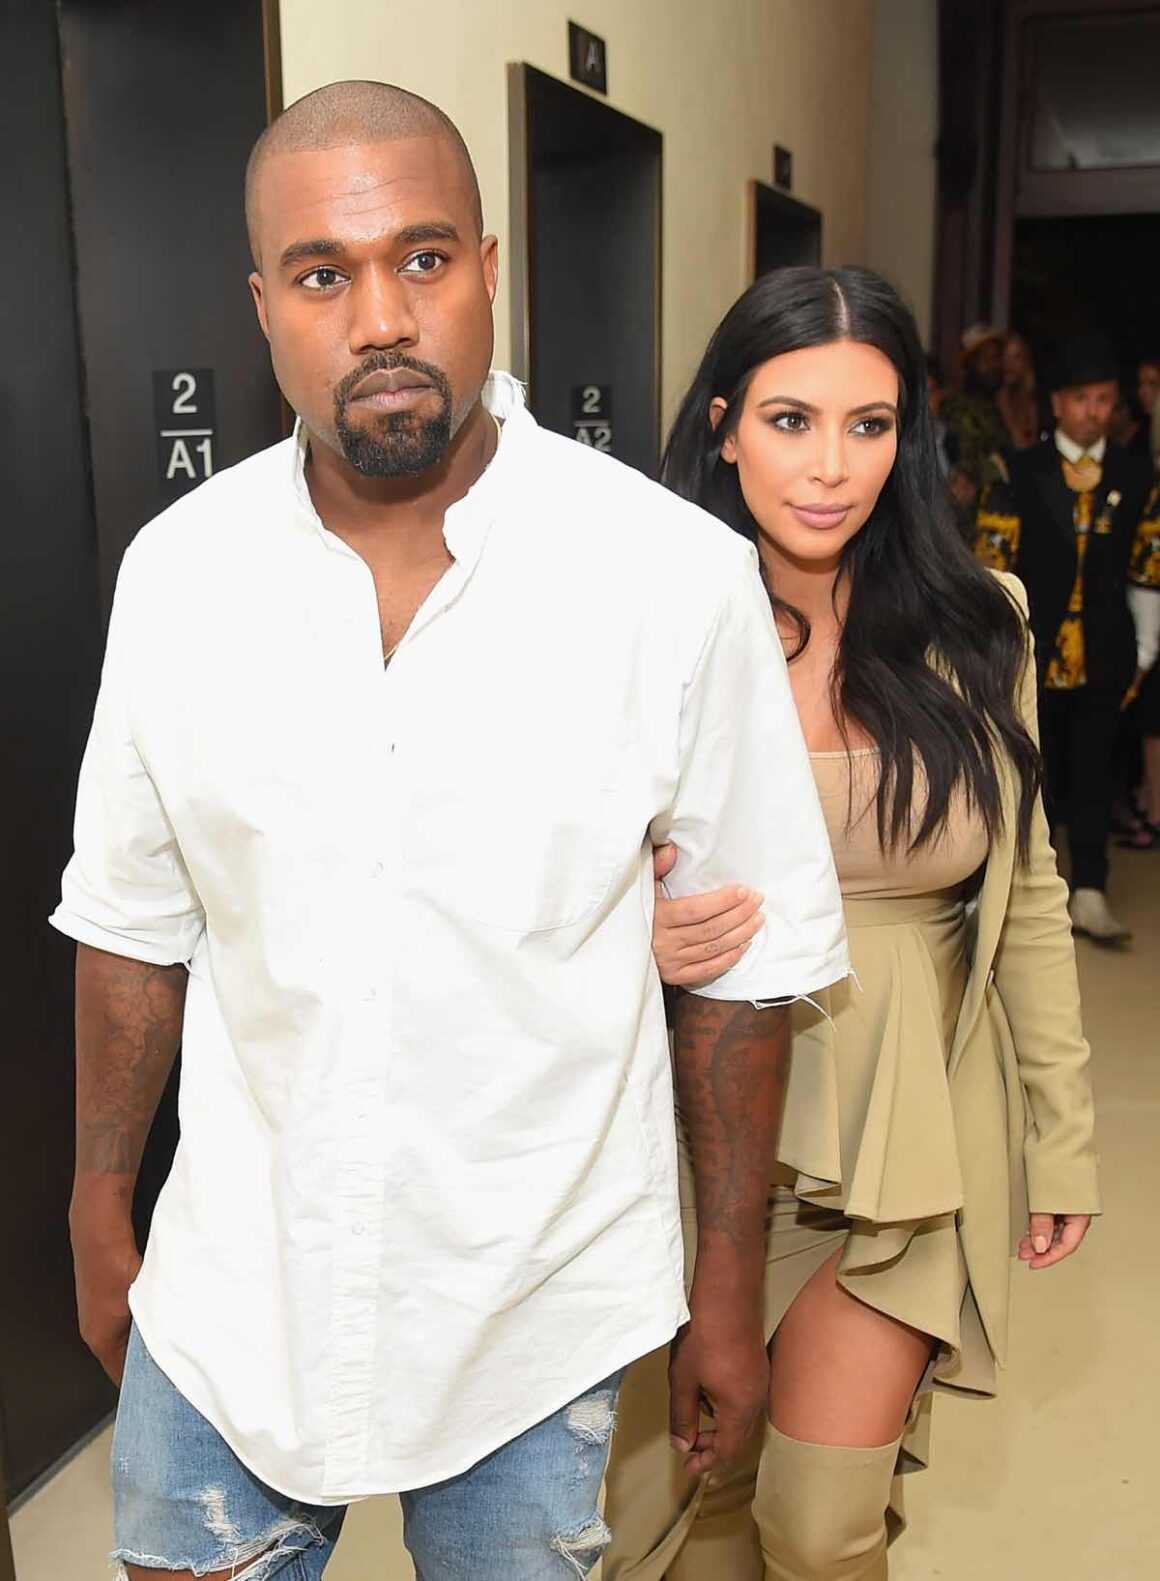 Kanye West and Kim Kardashian Rihanna Party At The New York EDITION